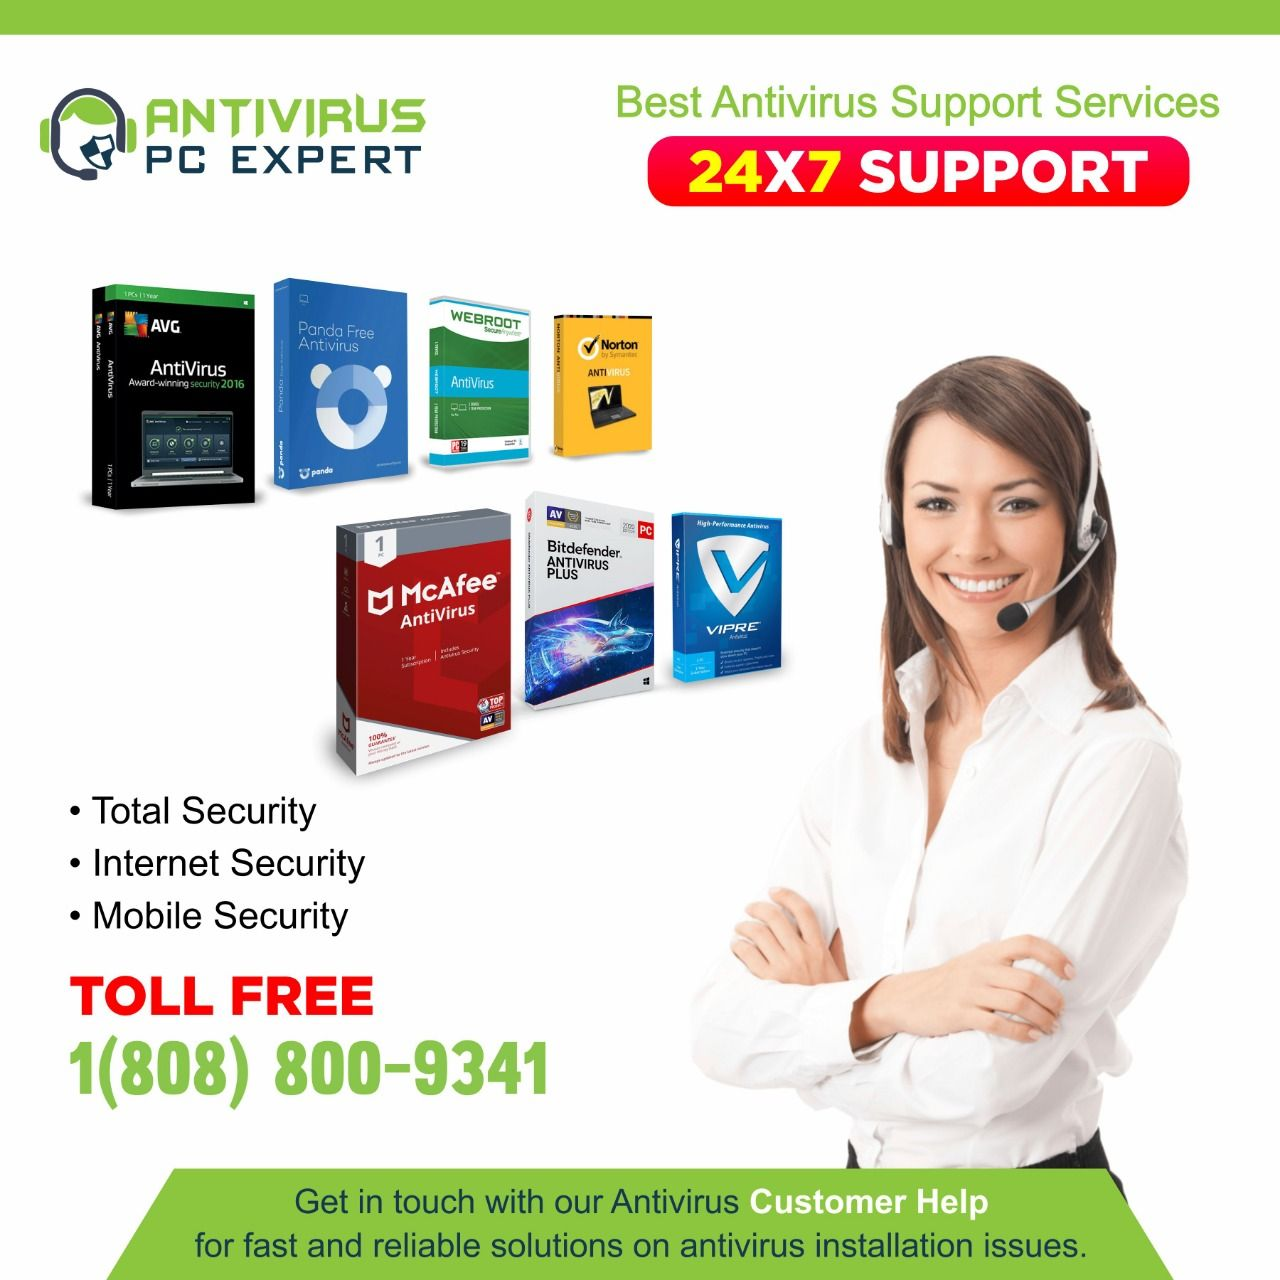 Antivirus Technical Customer Support Service in 2020